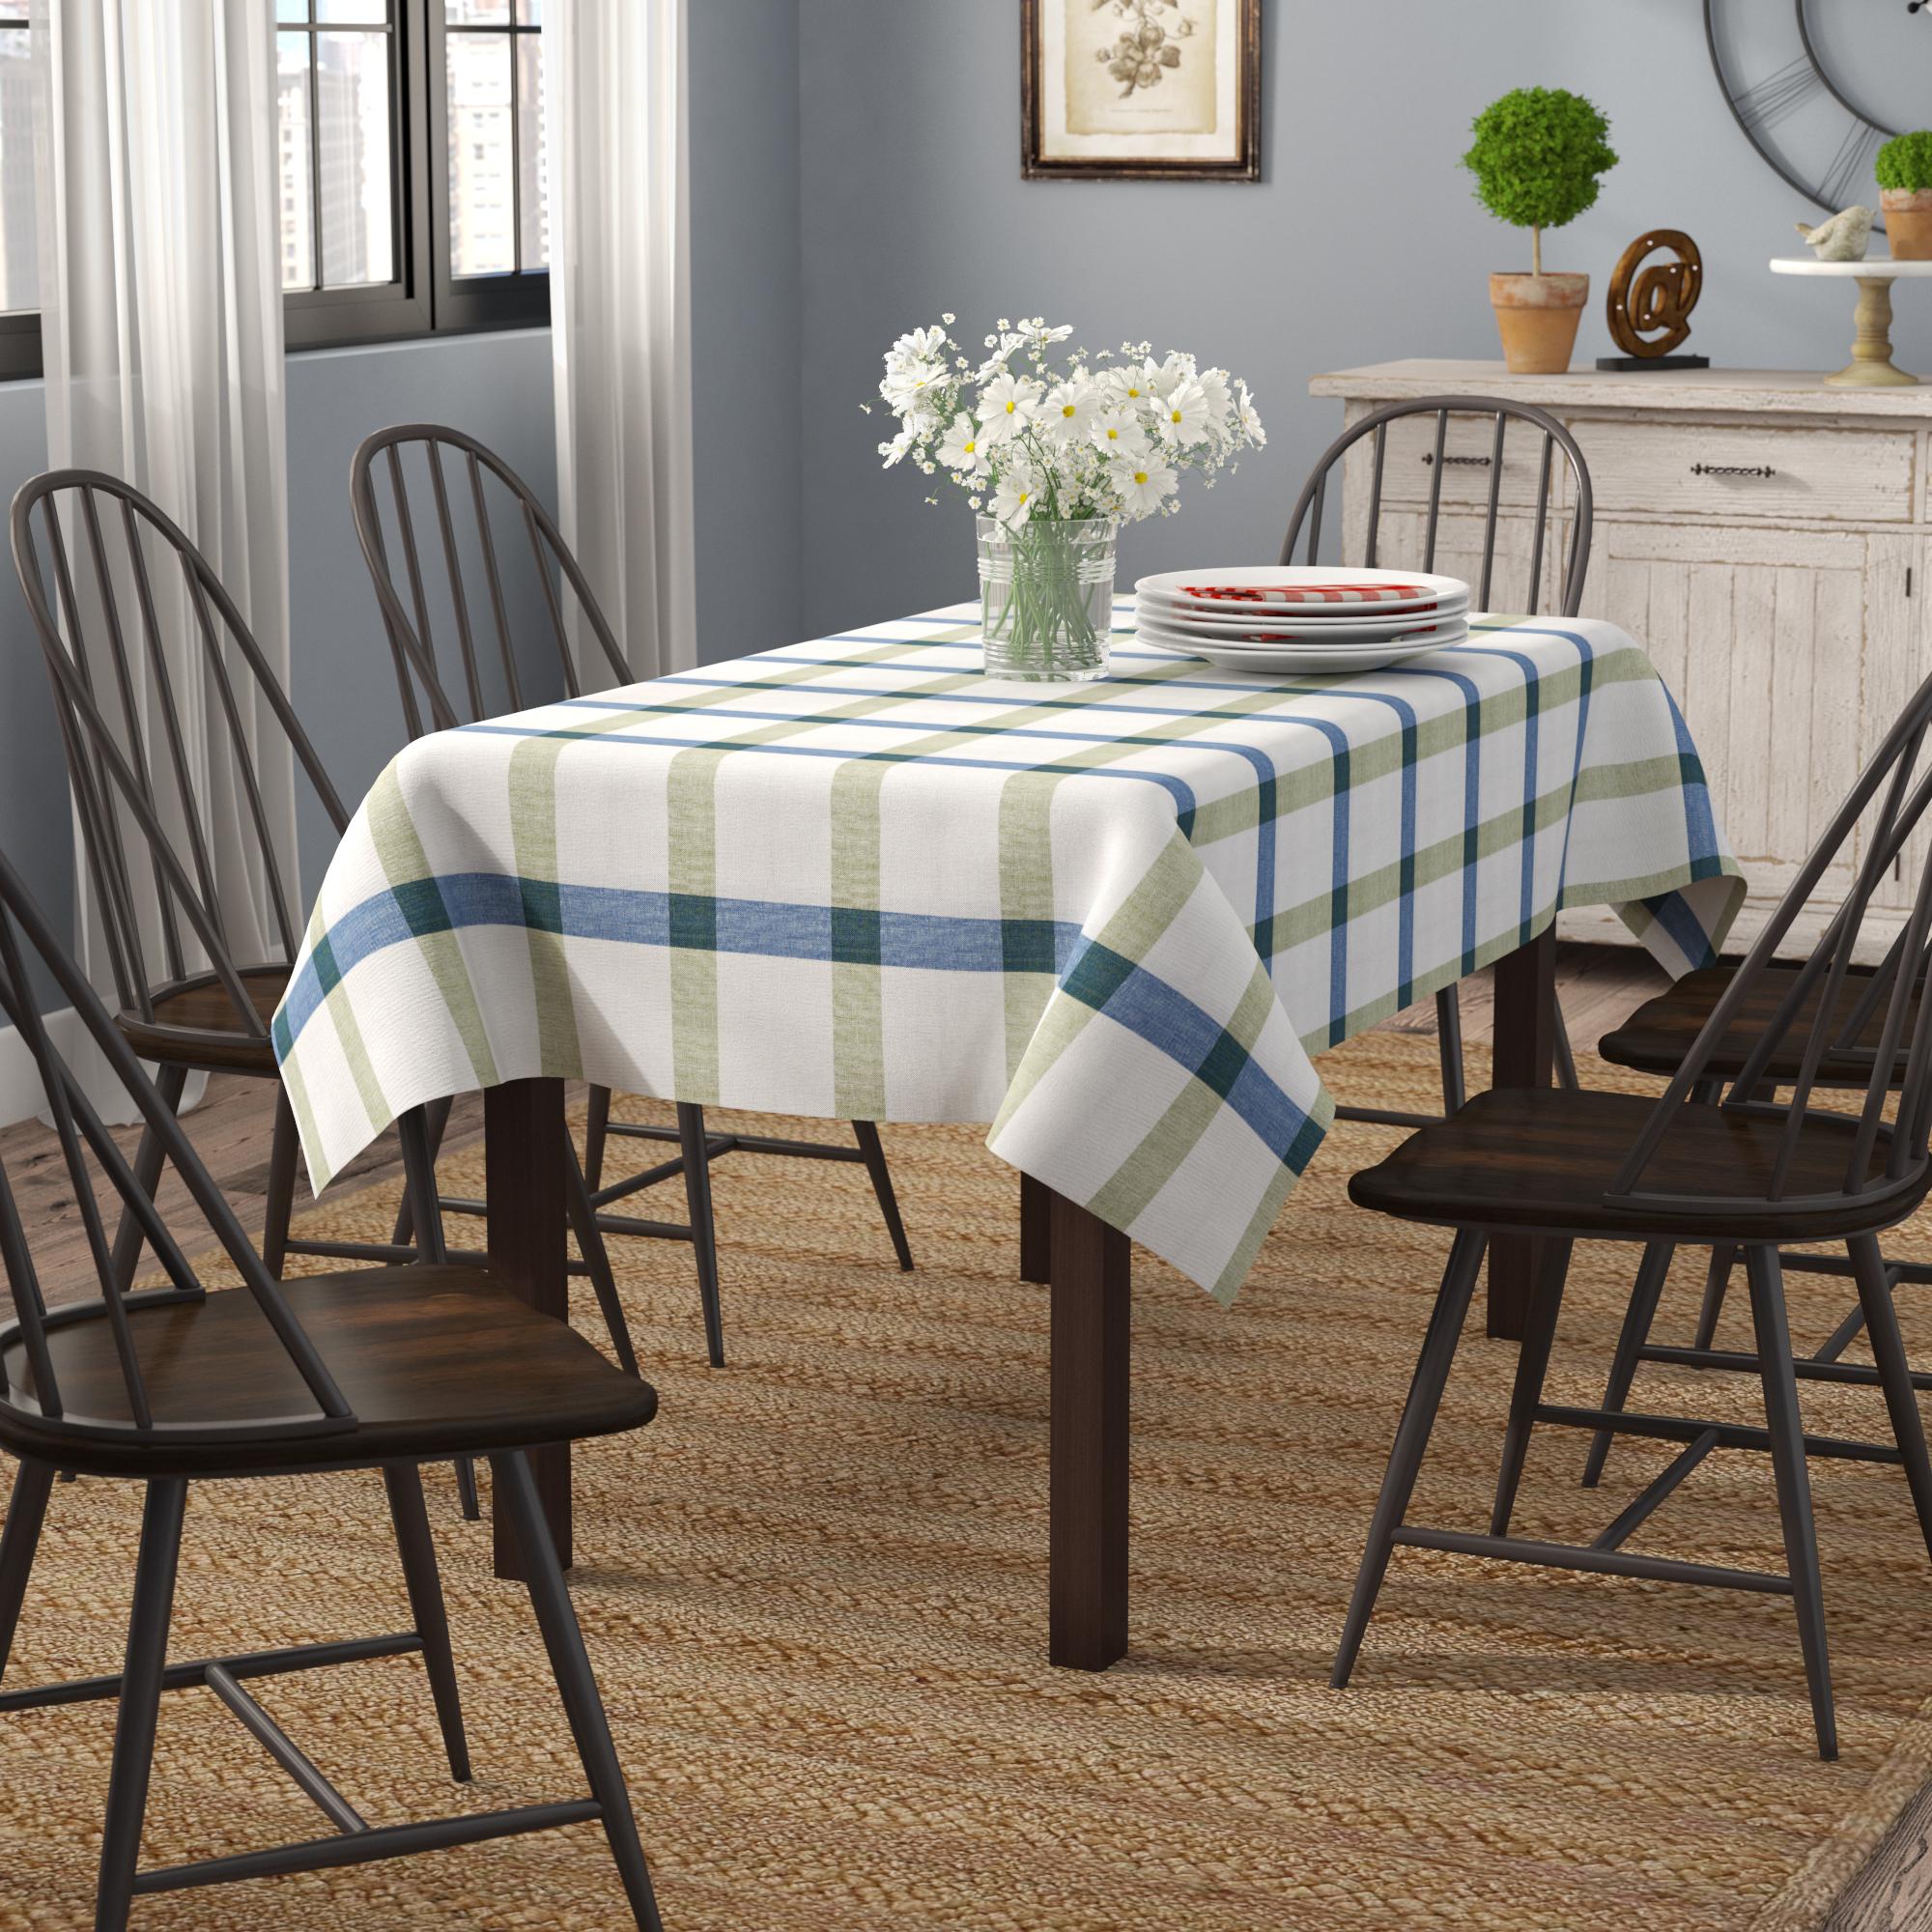 Tablecloths & Table Linens